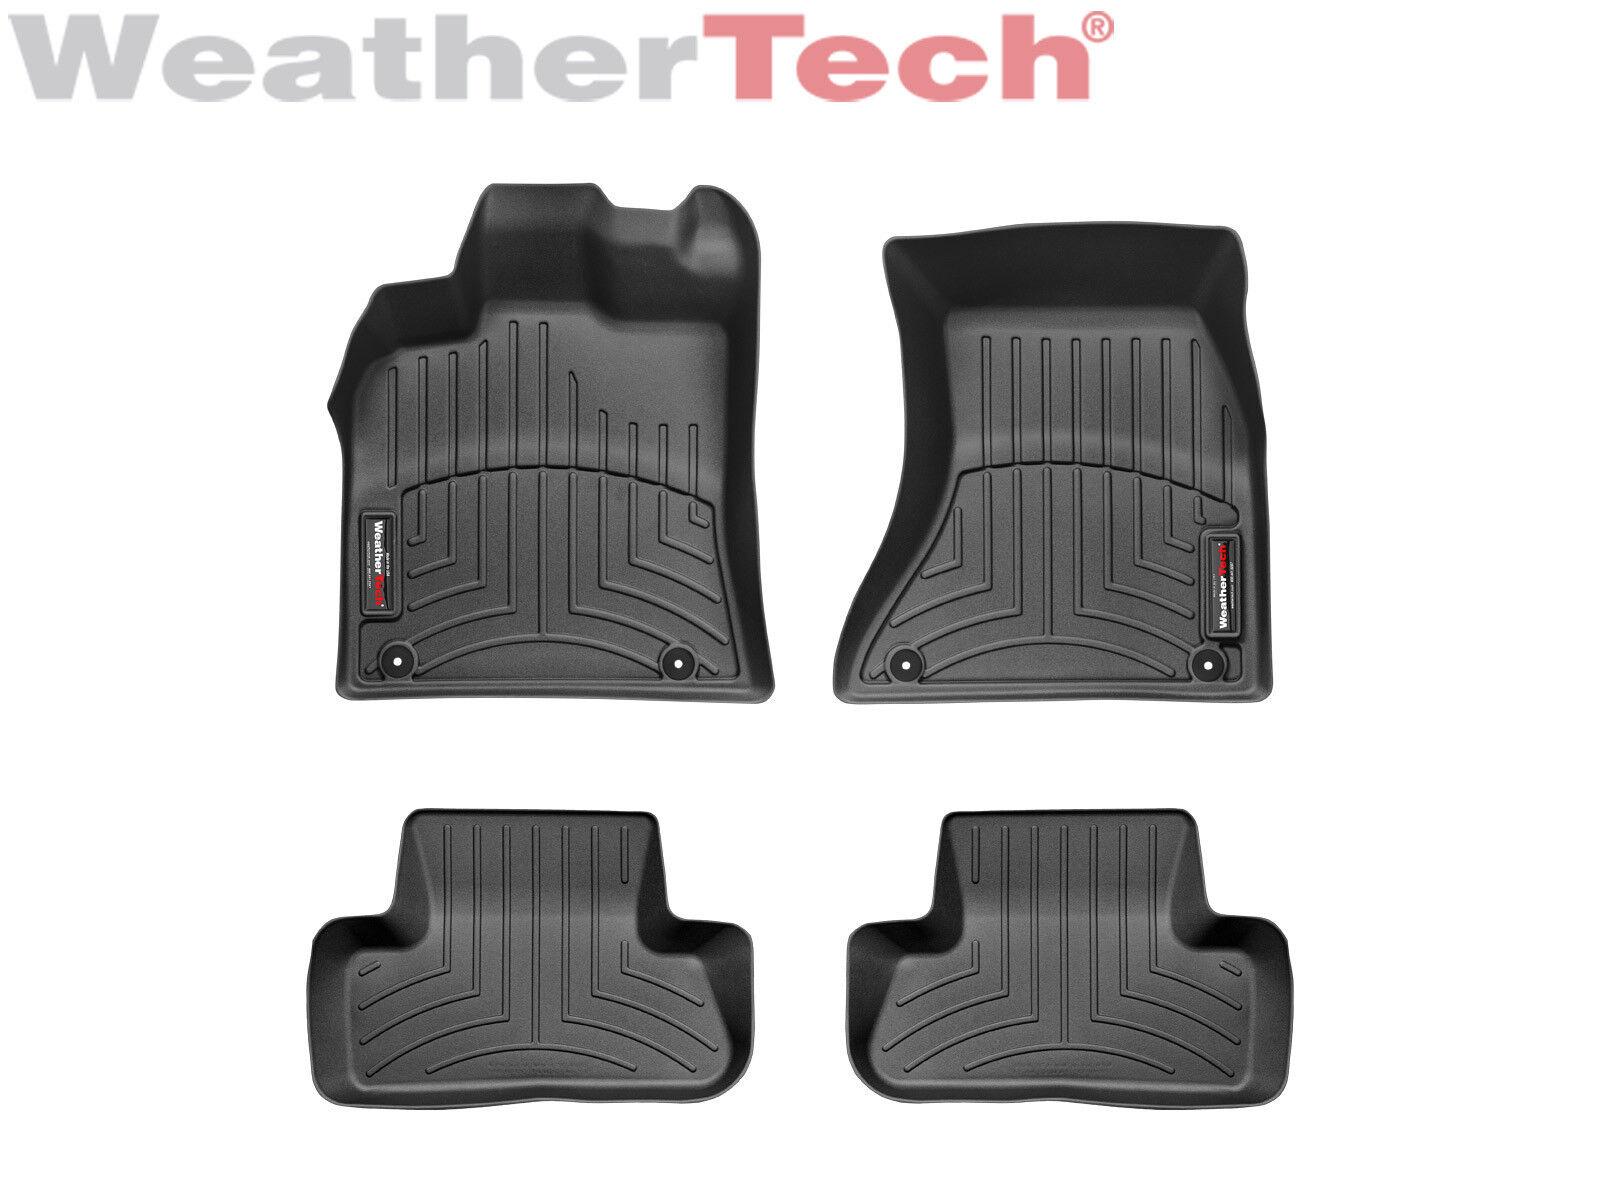 WeatherTech FloorLiner Mats for BMW 7-Series 2016-2019 1st 2nd Row Black